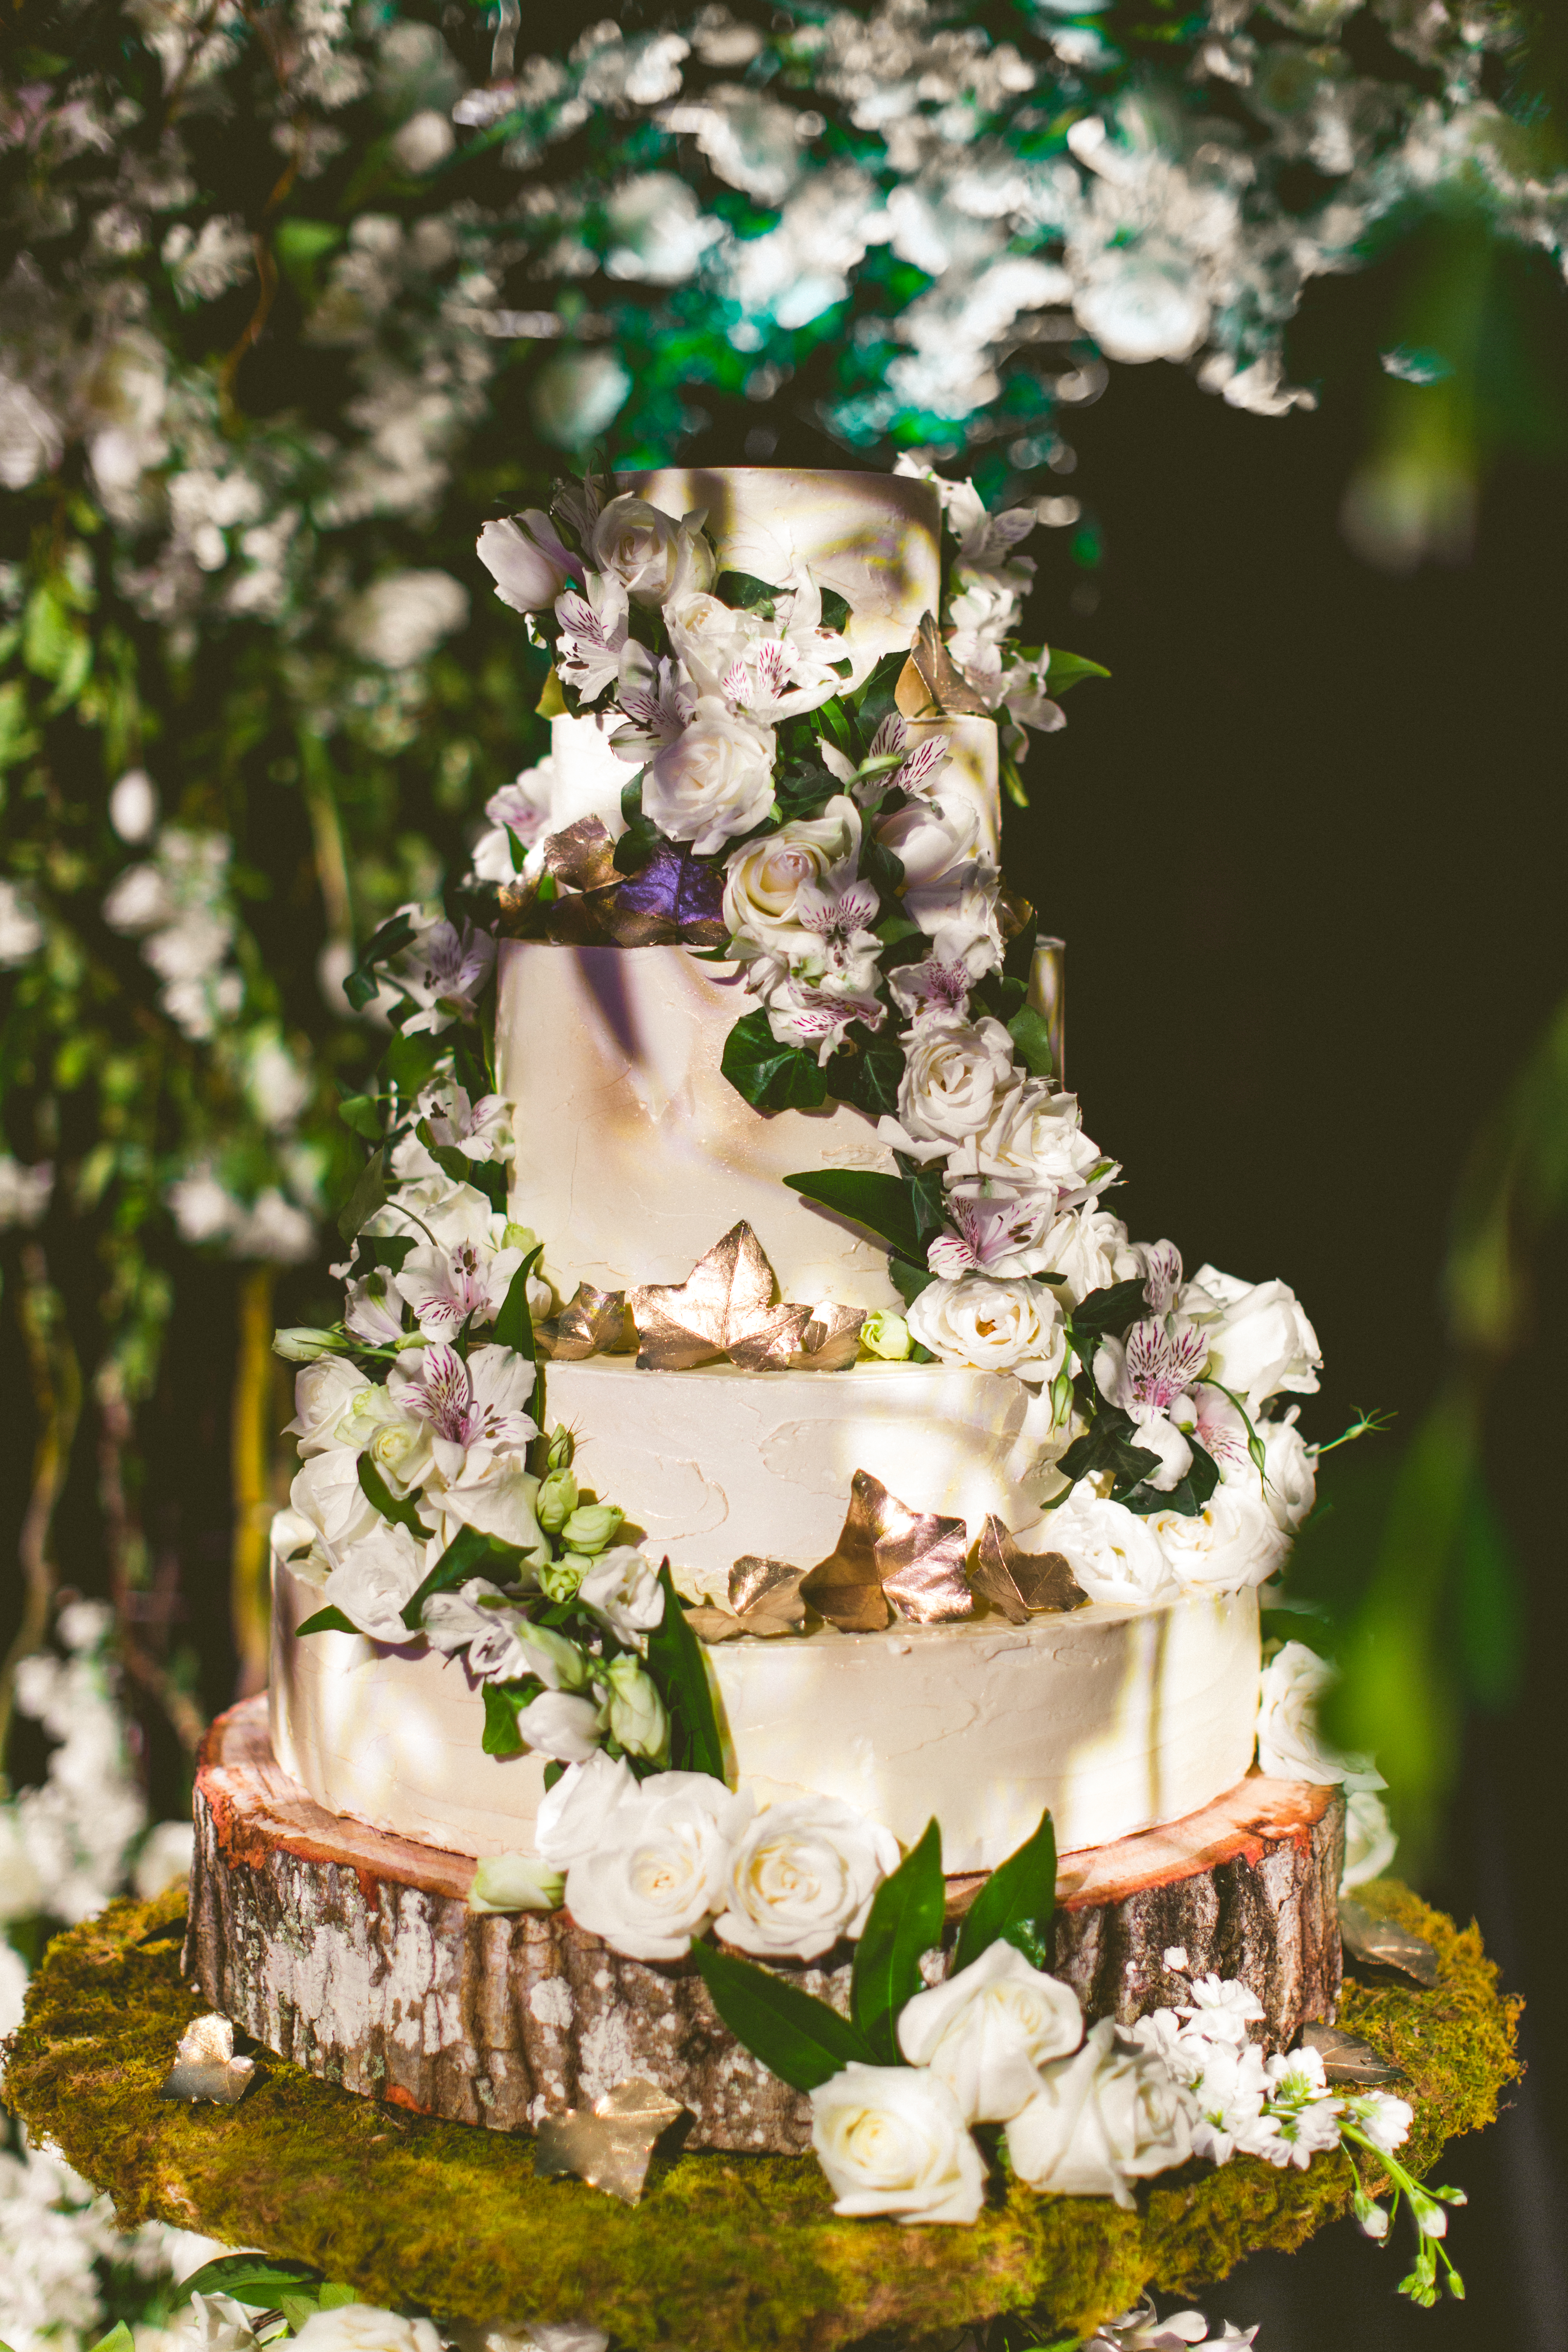 Enchanted Forest Wedding - Four Seasons Resort Orlando at Walt Disney World® Resort